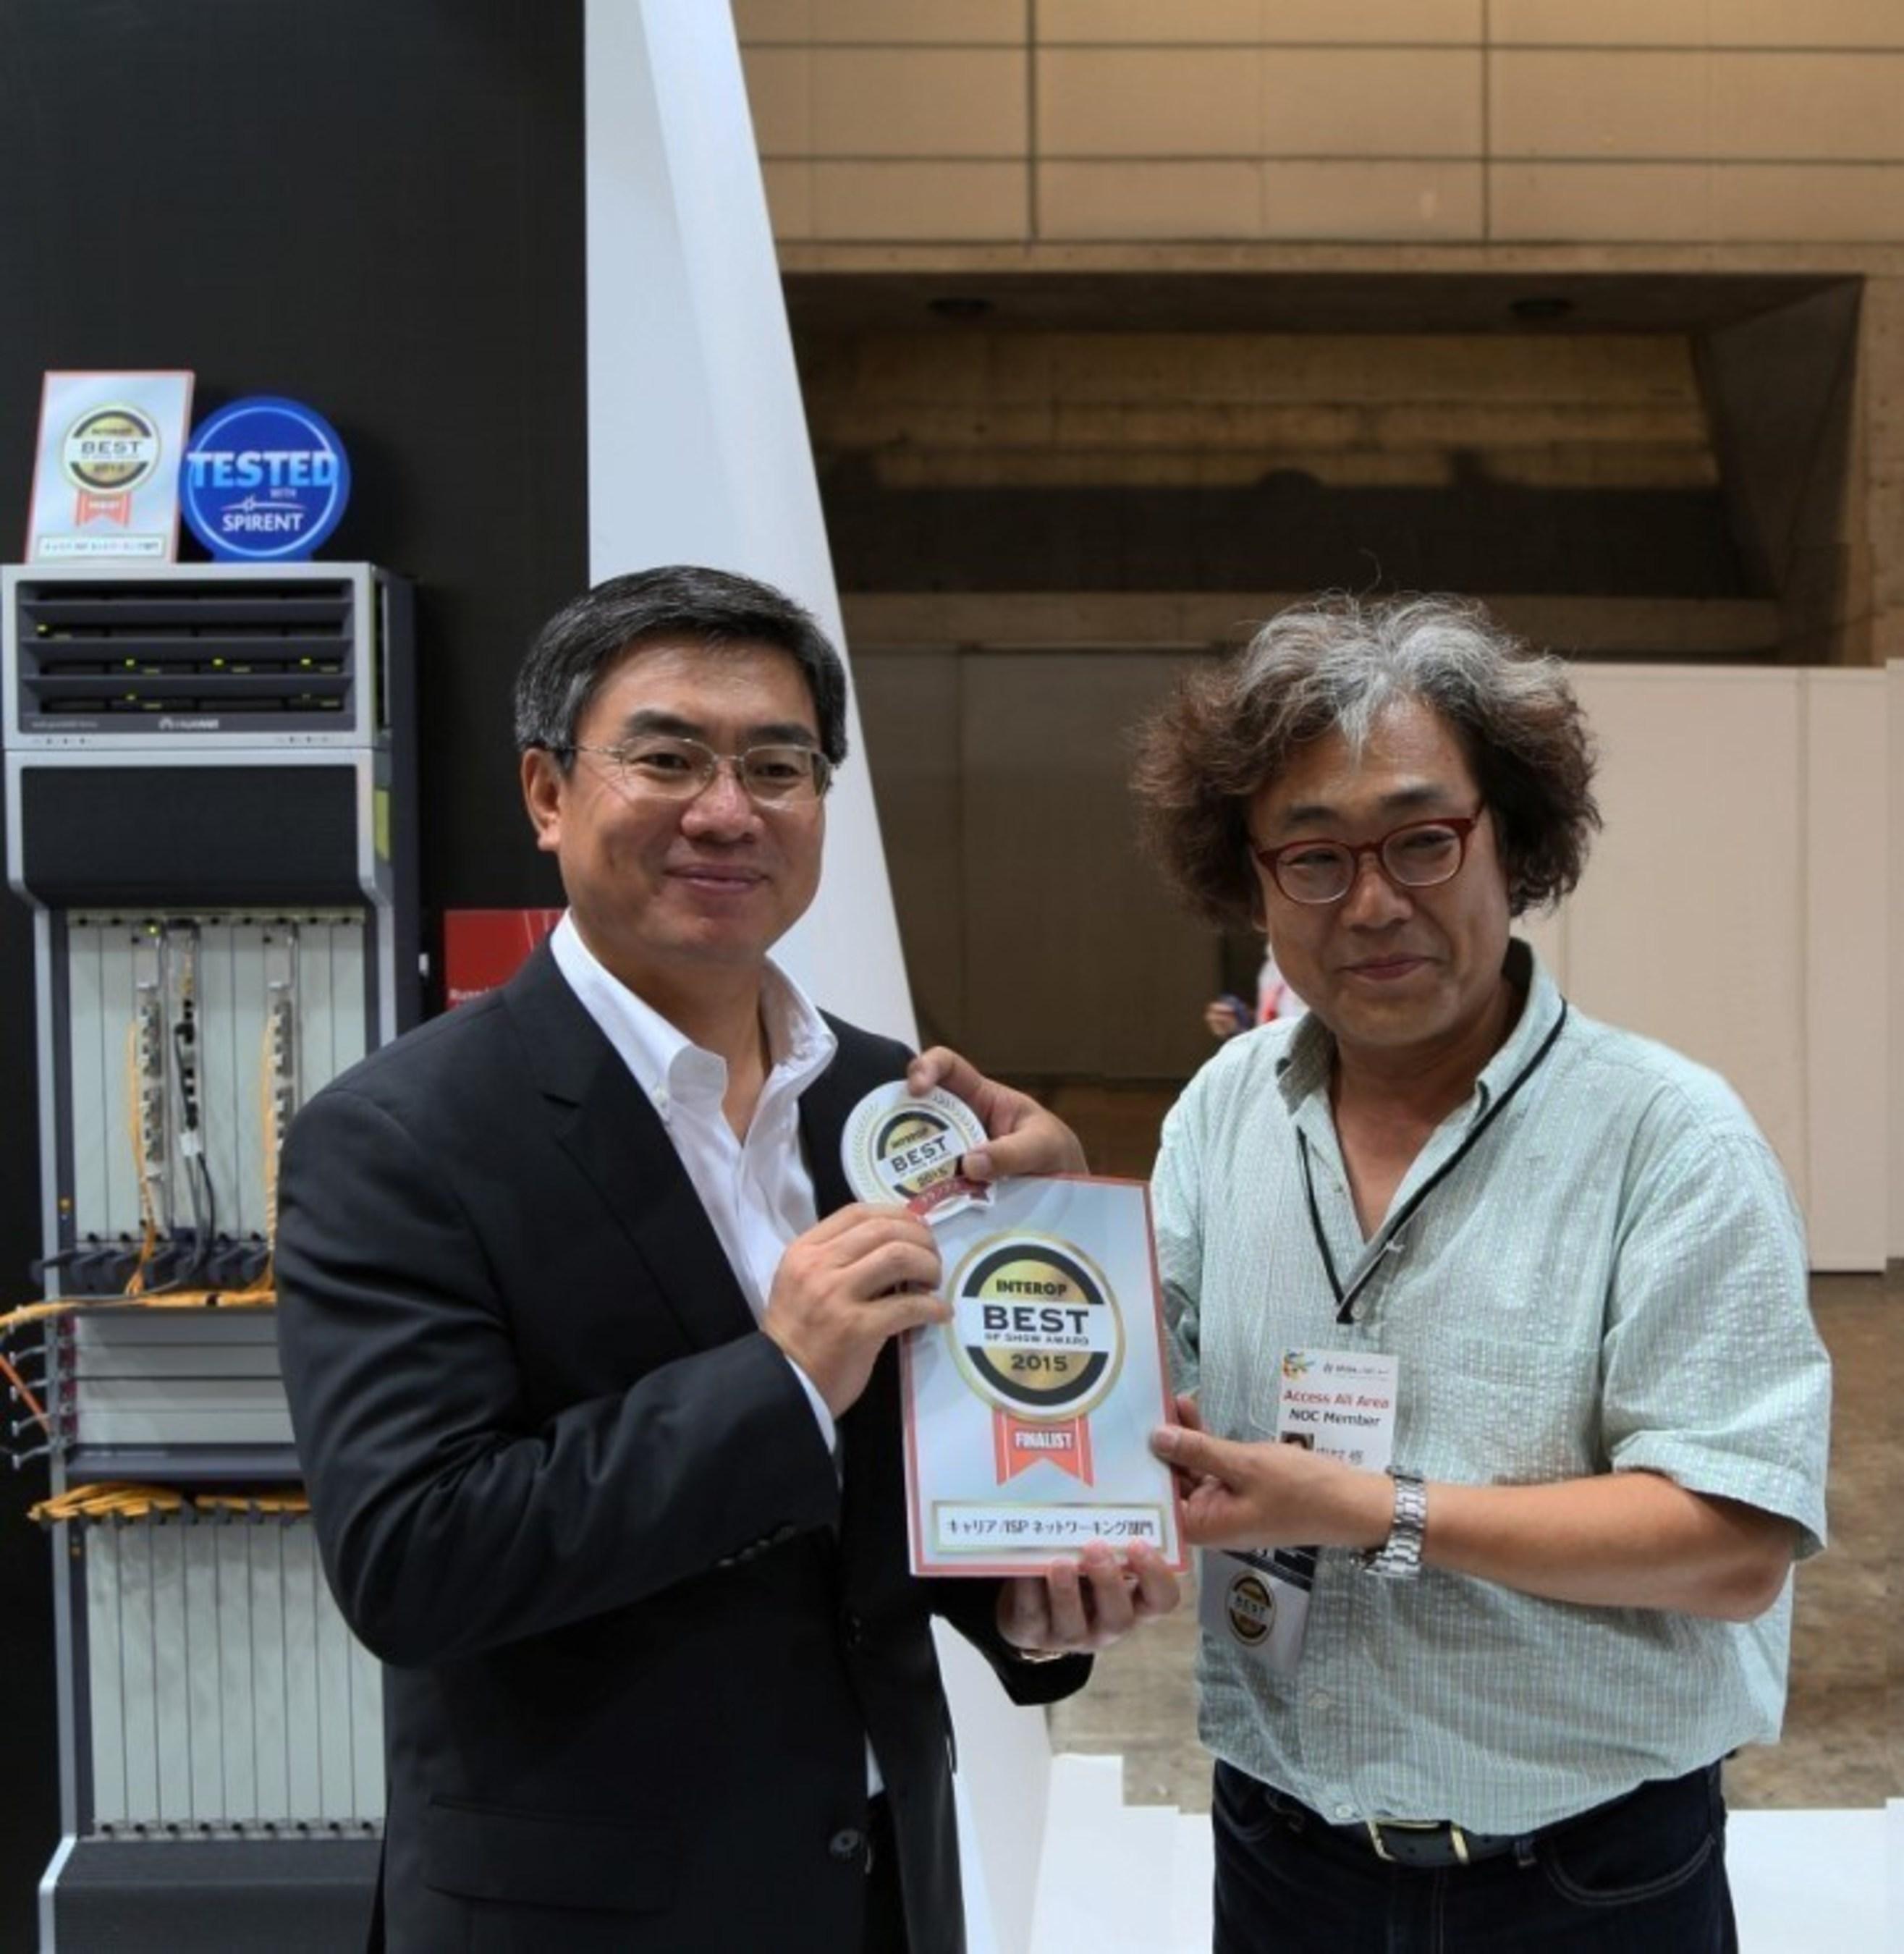 Huawei recebe prêmio 'Best of Show' na Interop Tokyo 2015